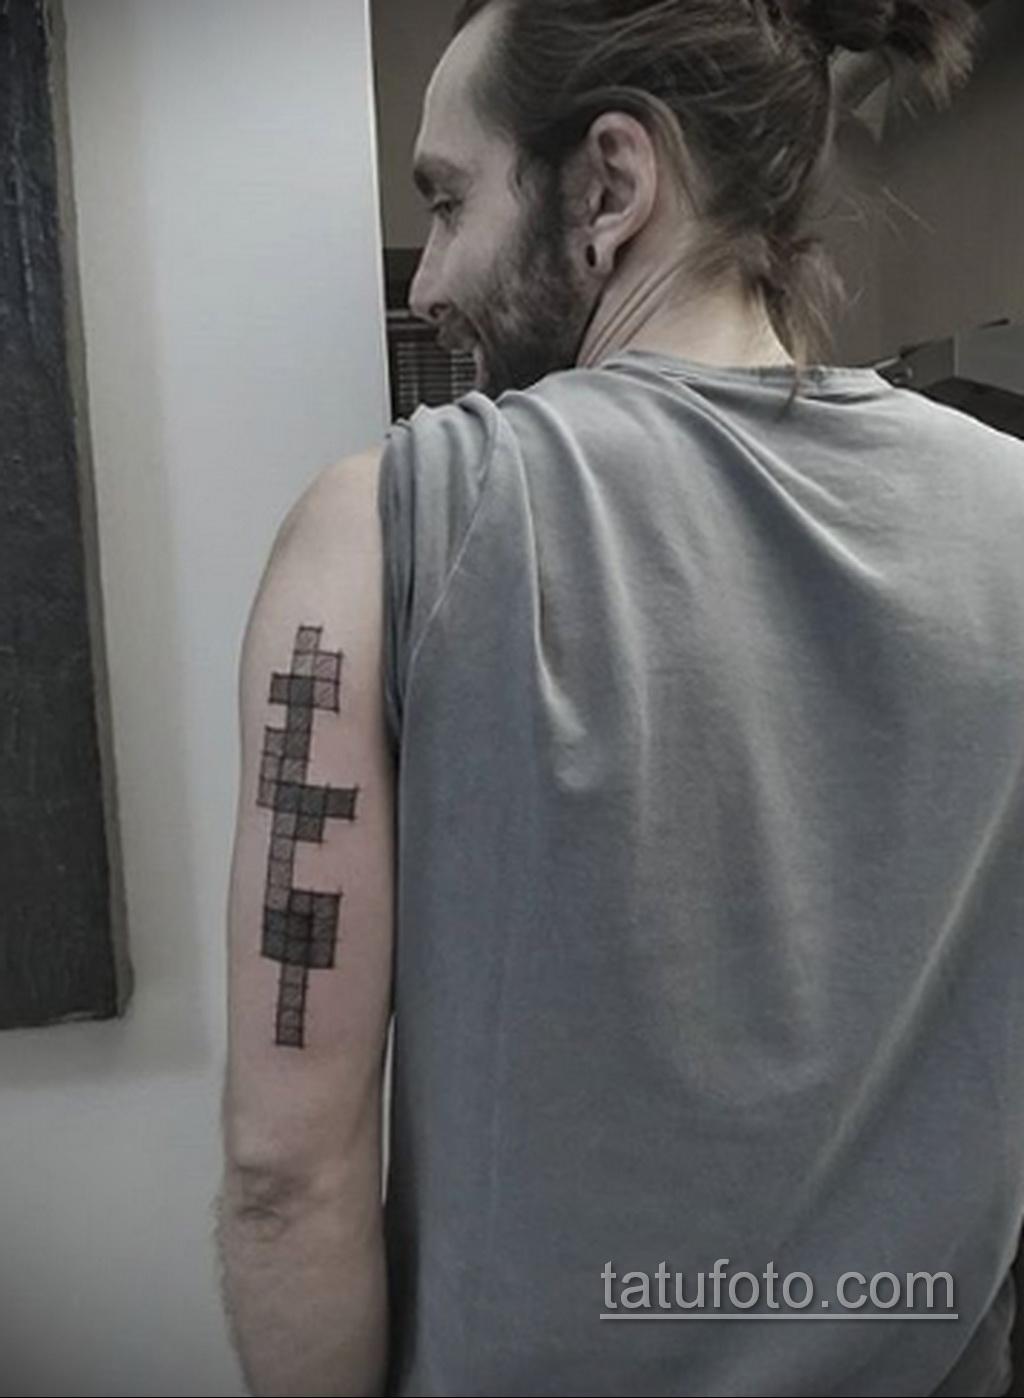 Фото татуировки с тетрисом 18.07.2020 №022 -tetris tattoo- tatufoto.com